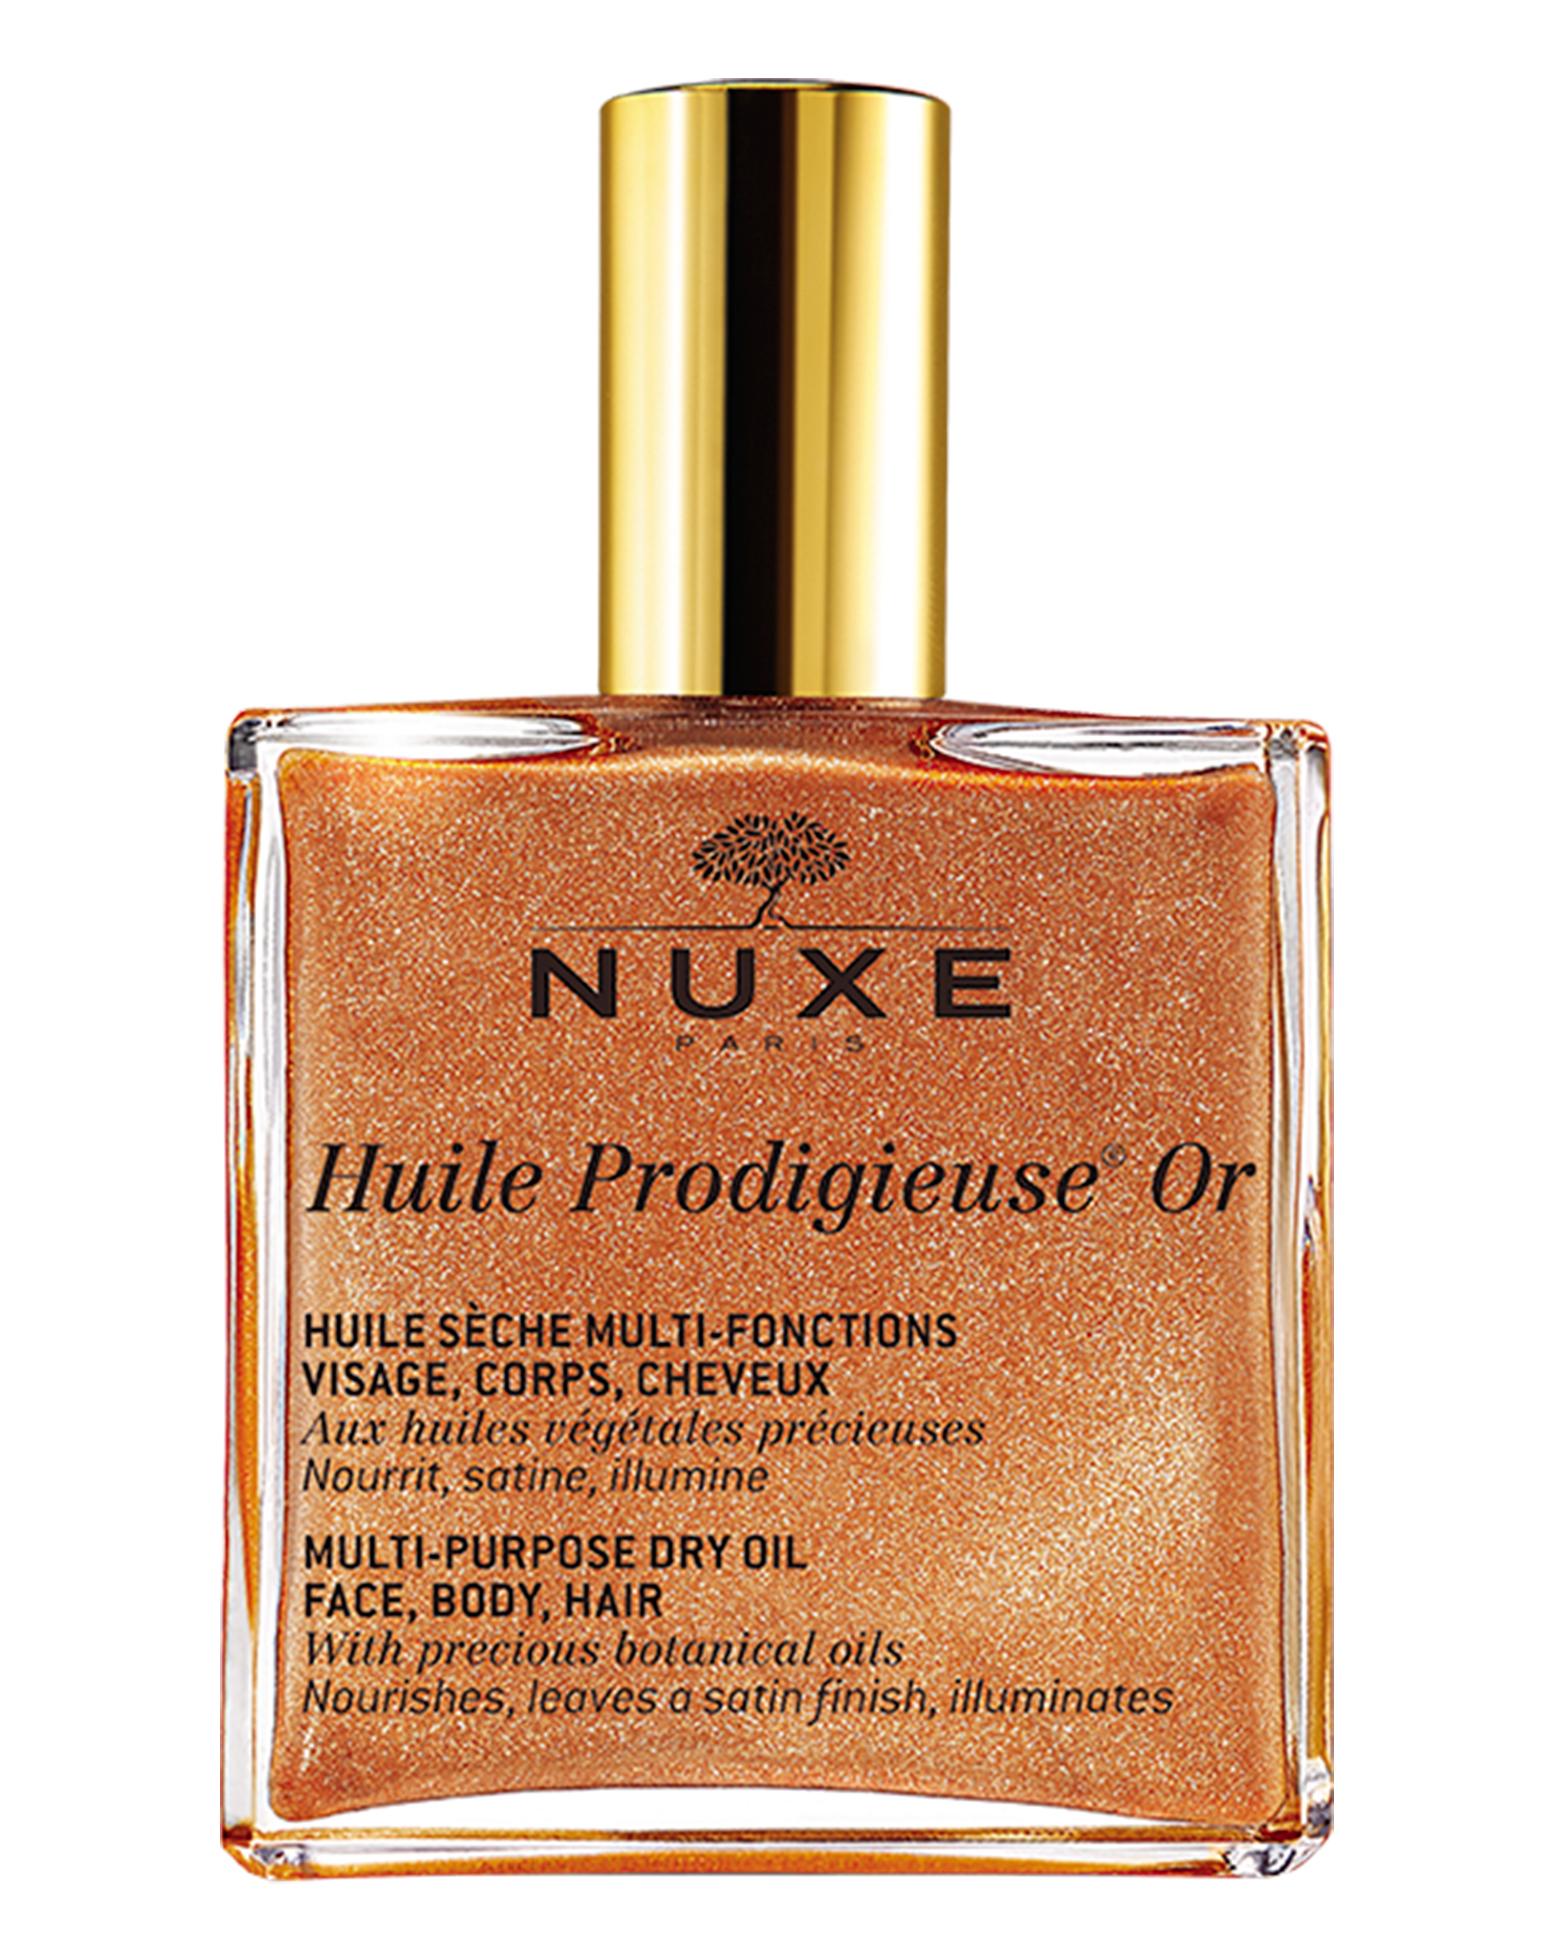 huile prodigieuse nuxe or